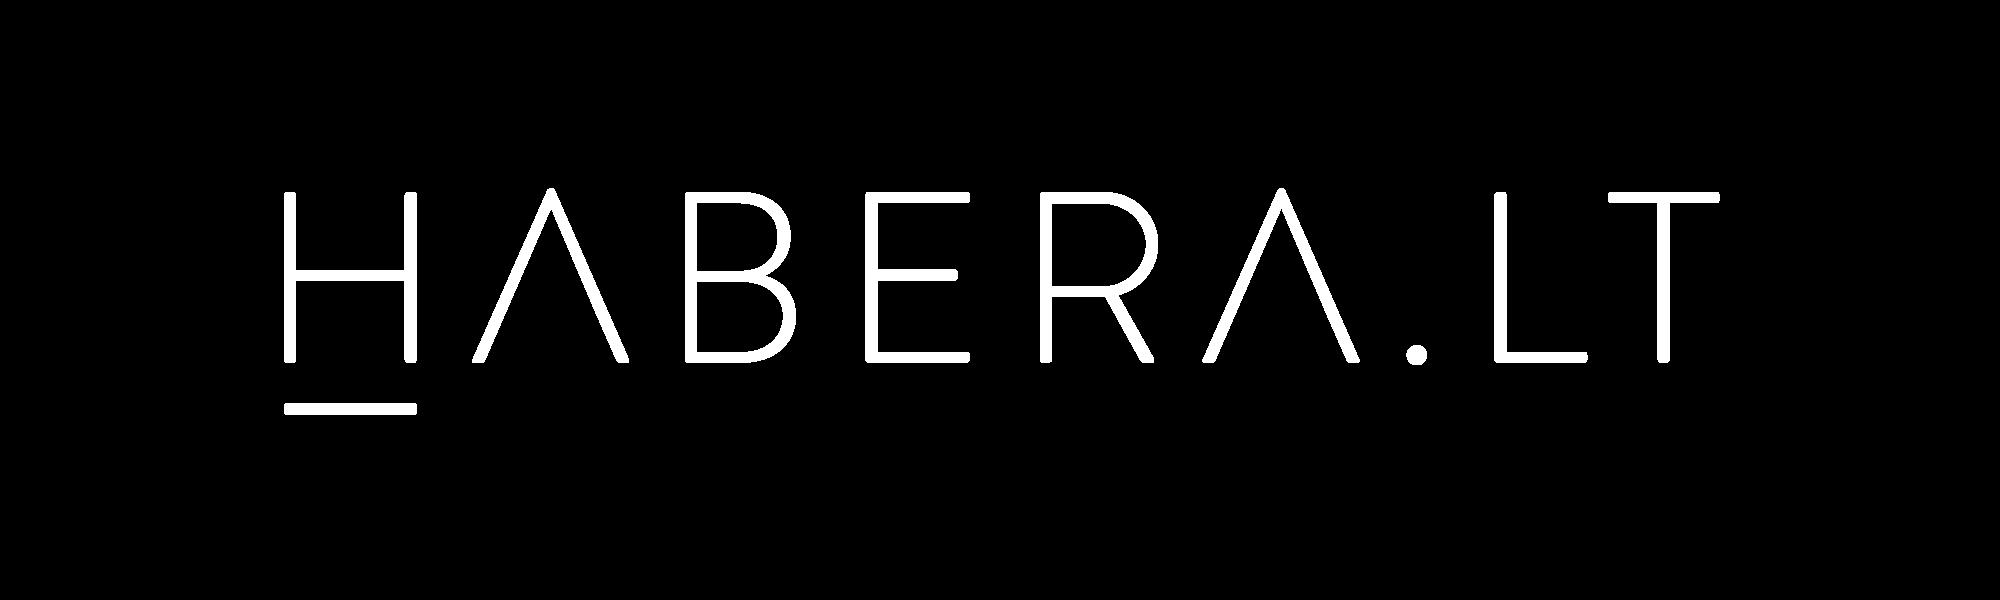 HABERA